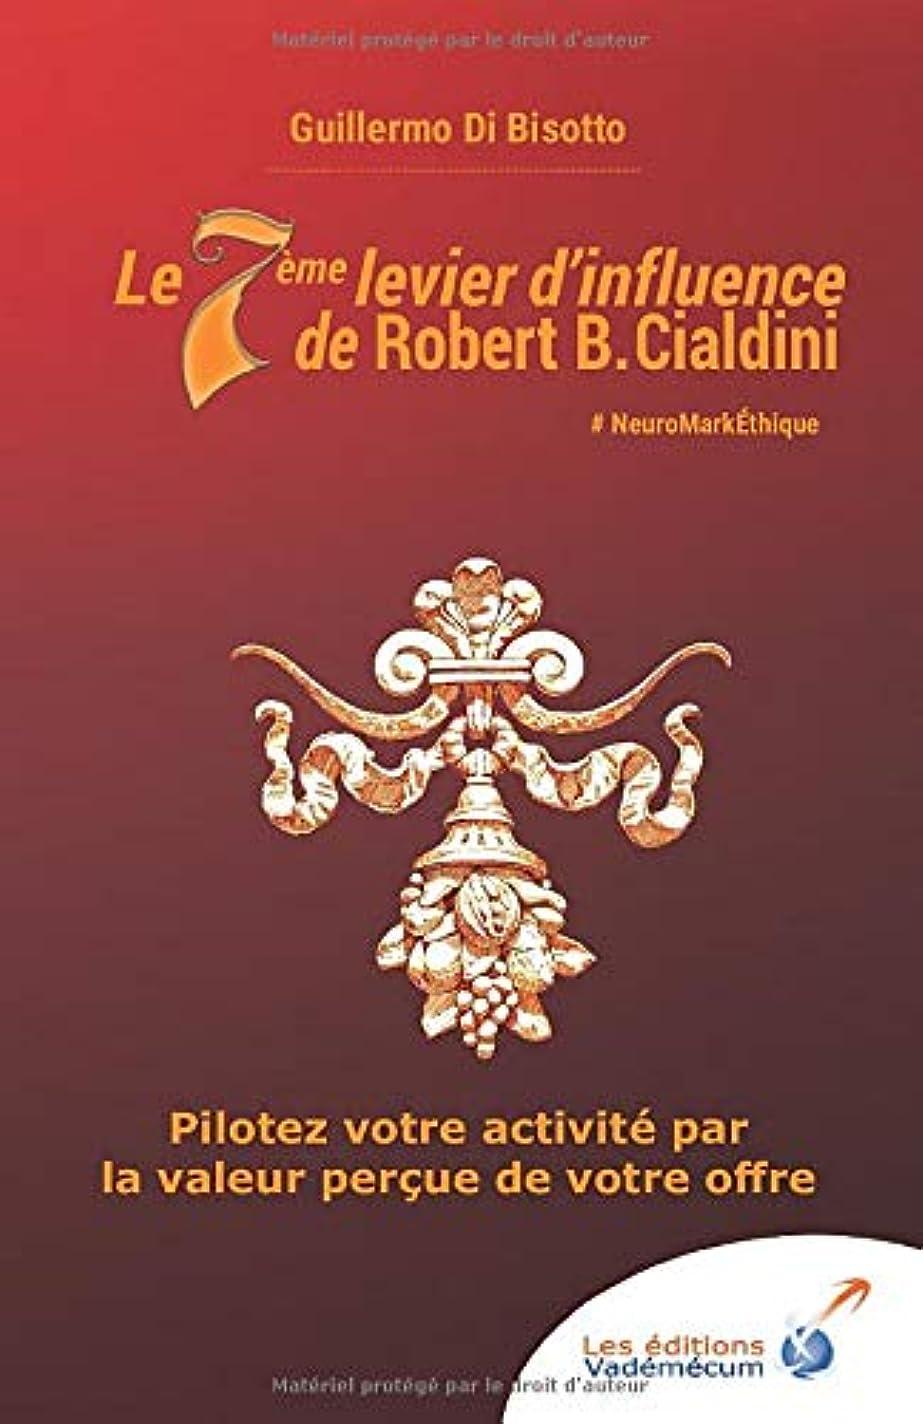 発表するタイヤ帽子Le 7ème levier d'influence de Robert B. Cialdini: Pilotez votre activité par la valeur per?ue de votre offre